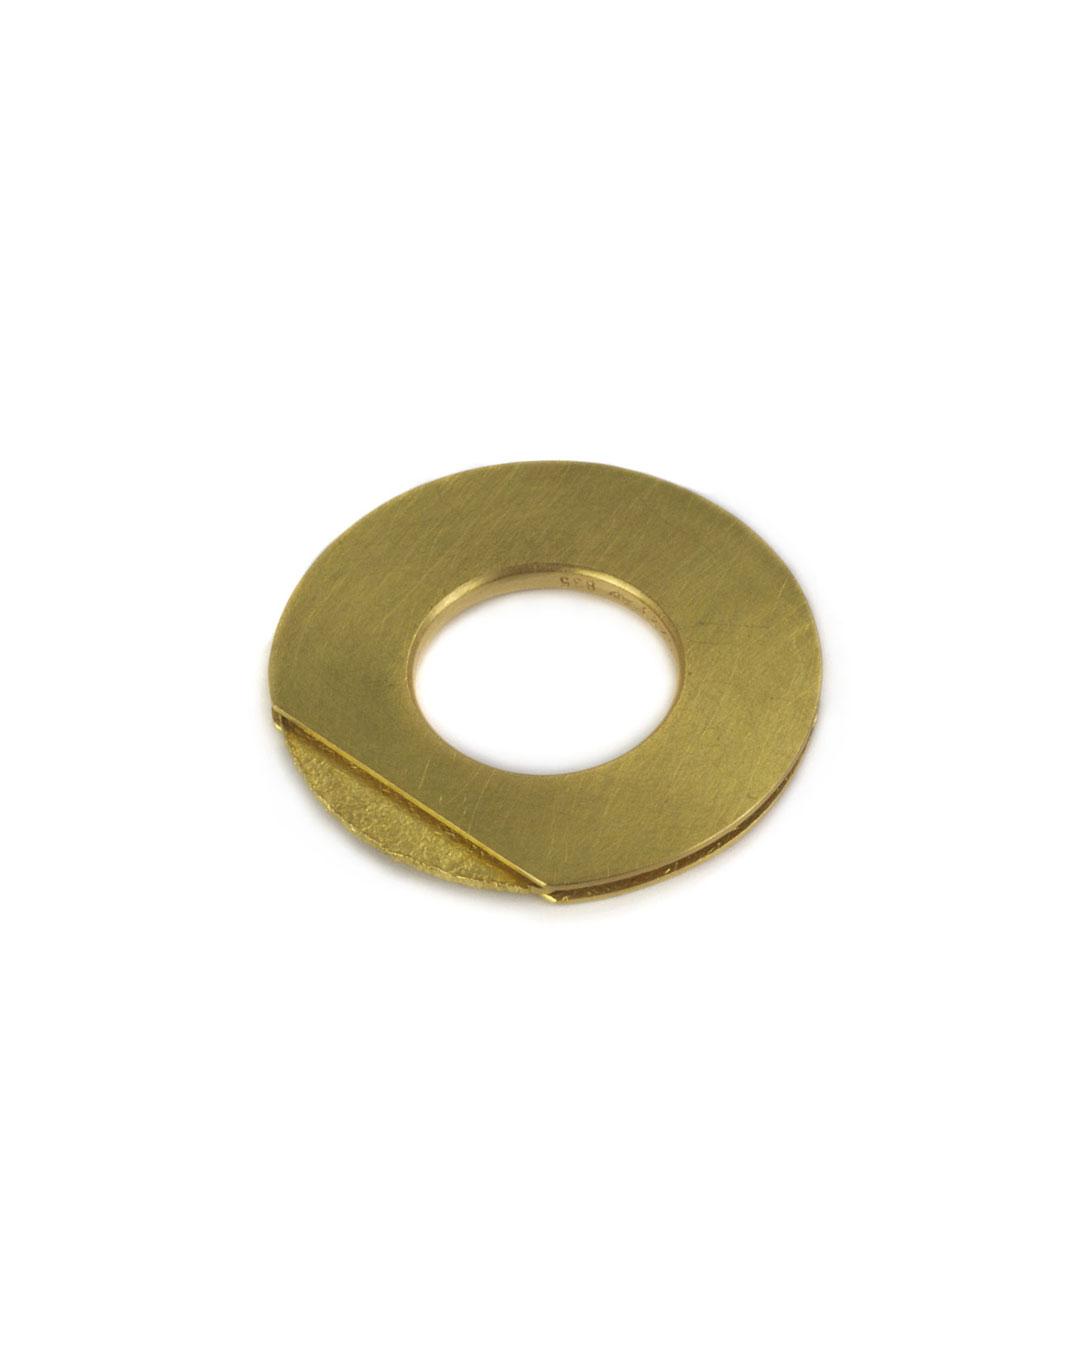 Okinari Kurokawa, untitled, 2002, ring; 20ct gold, ø 34 x 3 mm, €3150